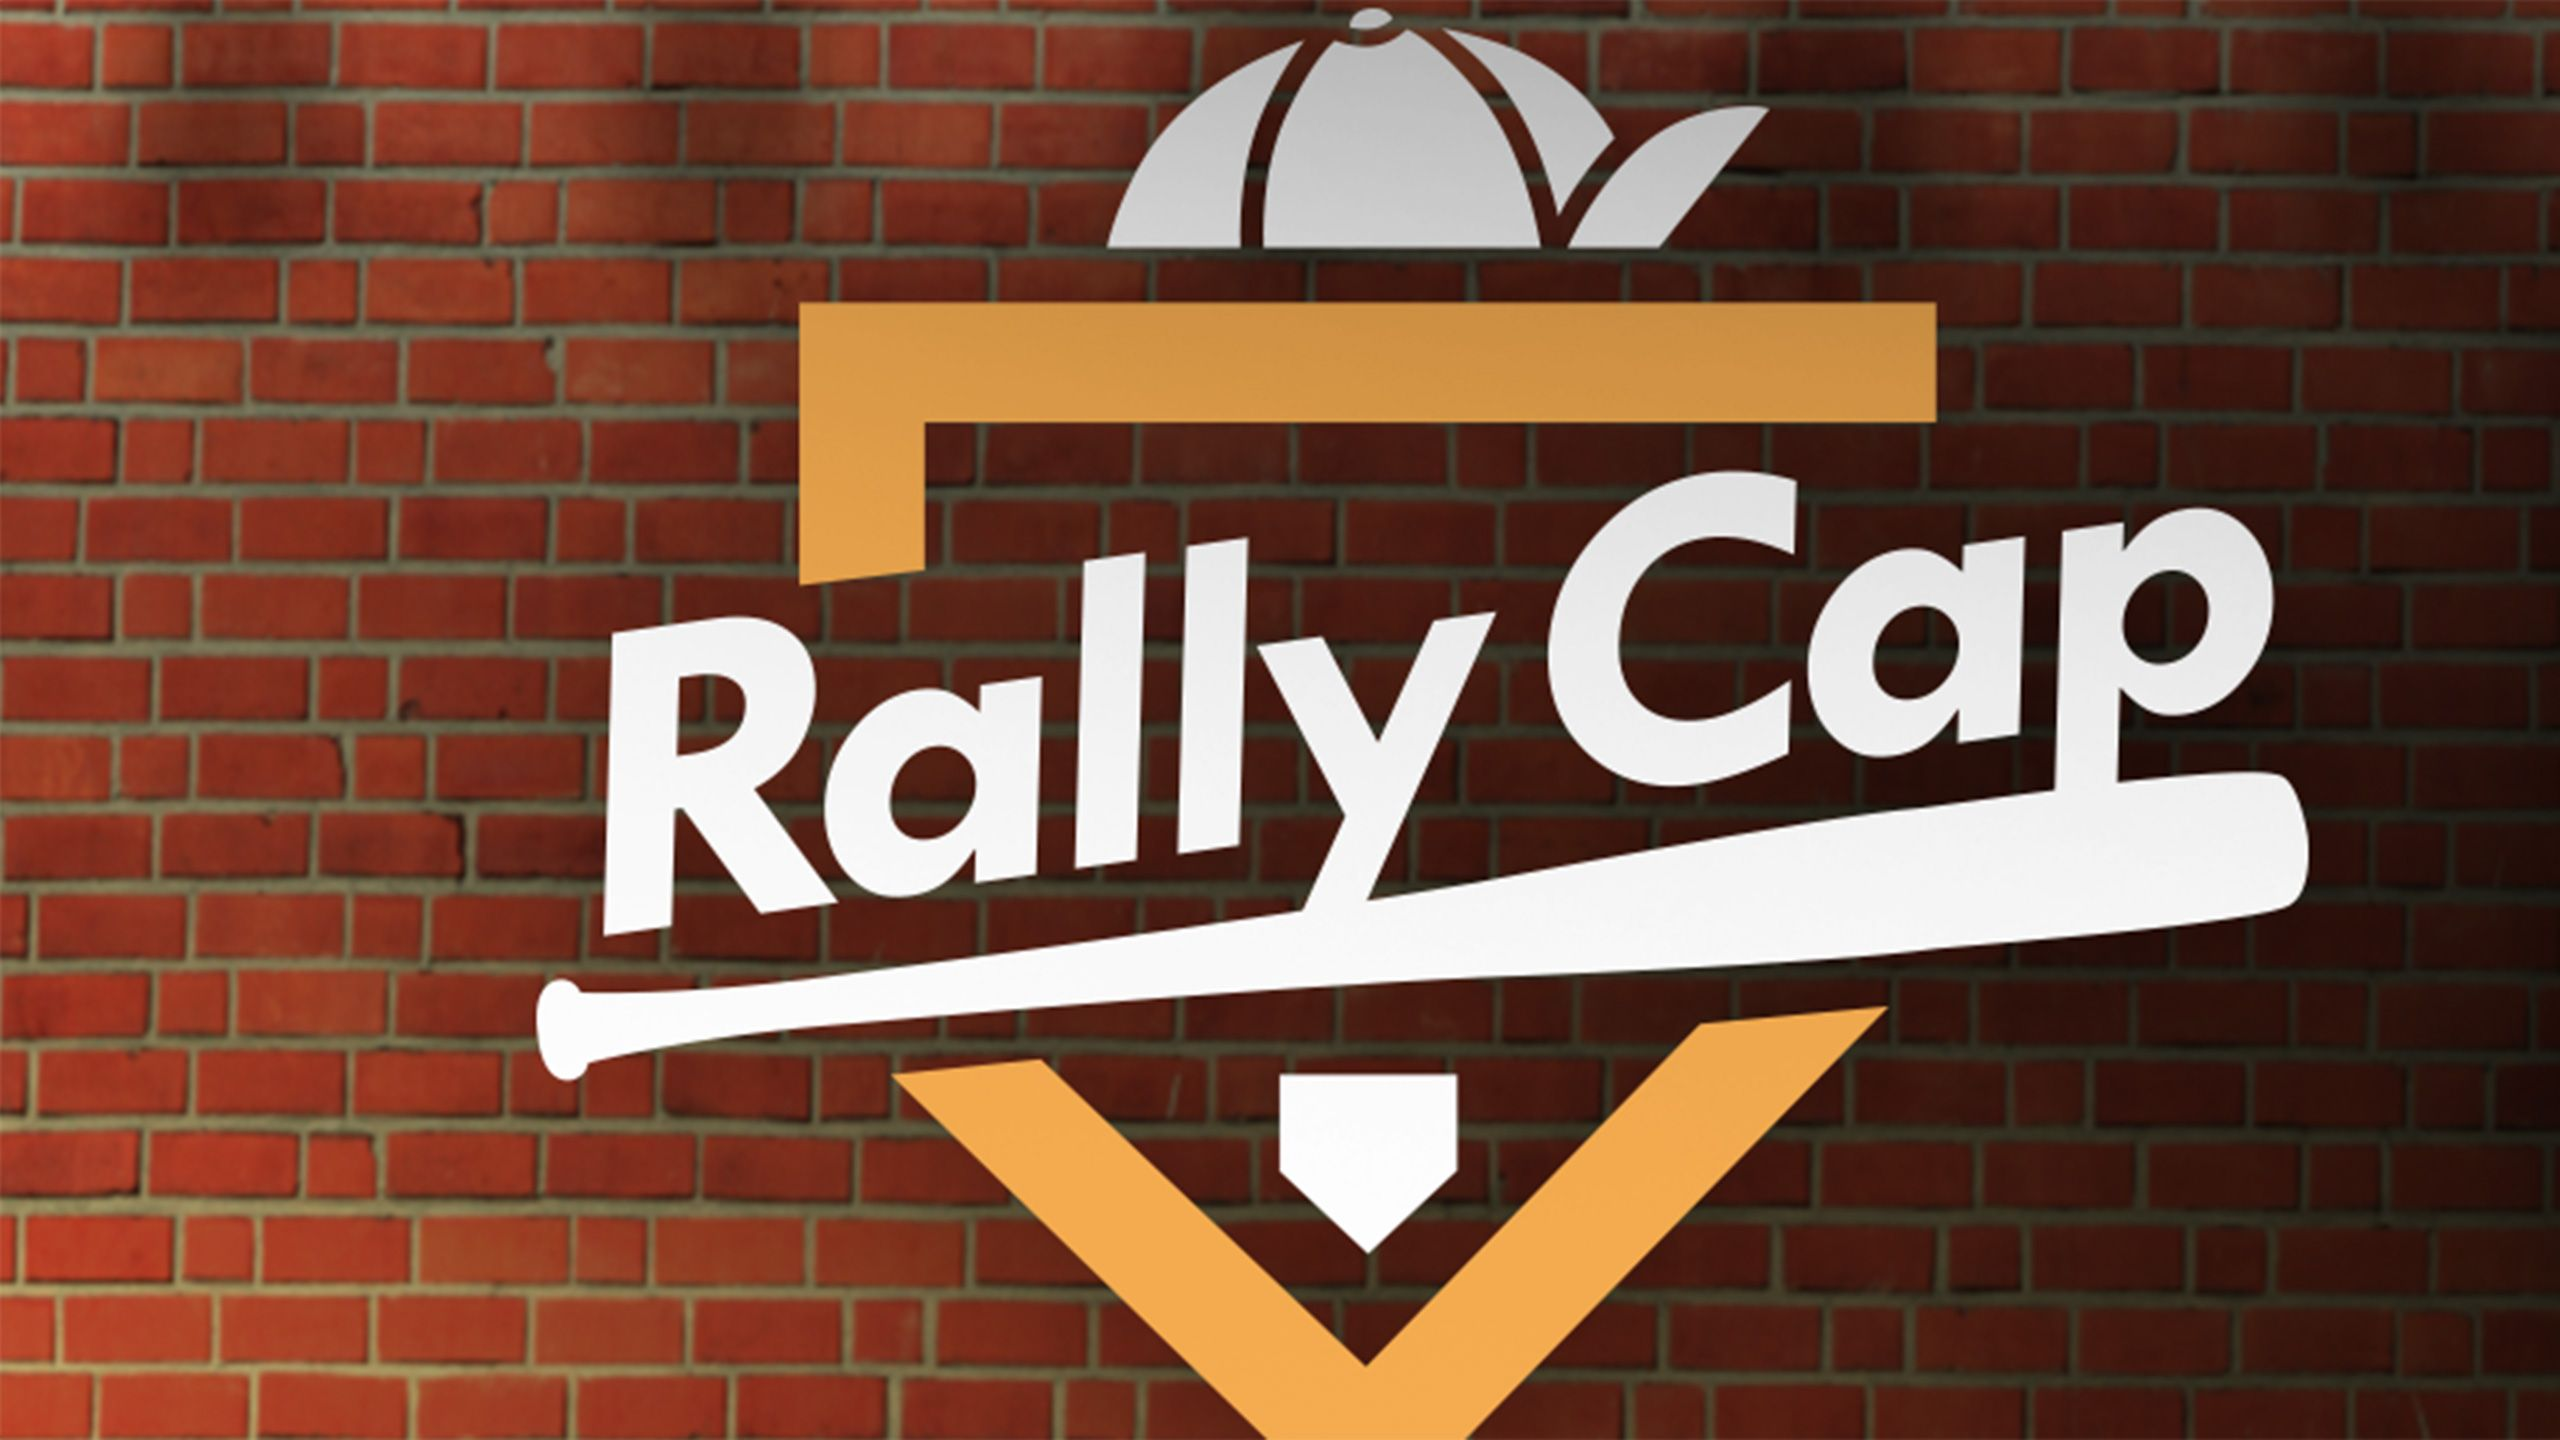 Sun, 4/22 - Rally Cap